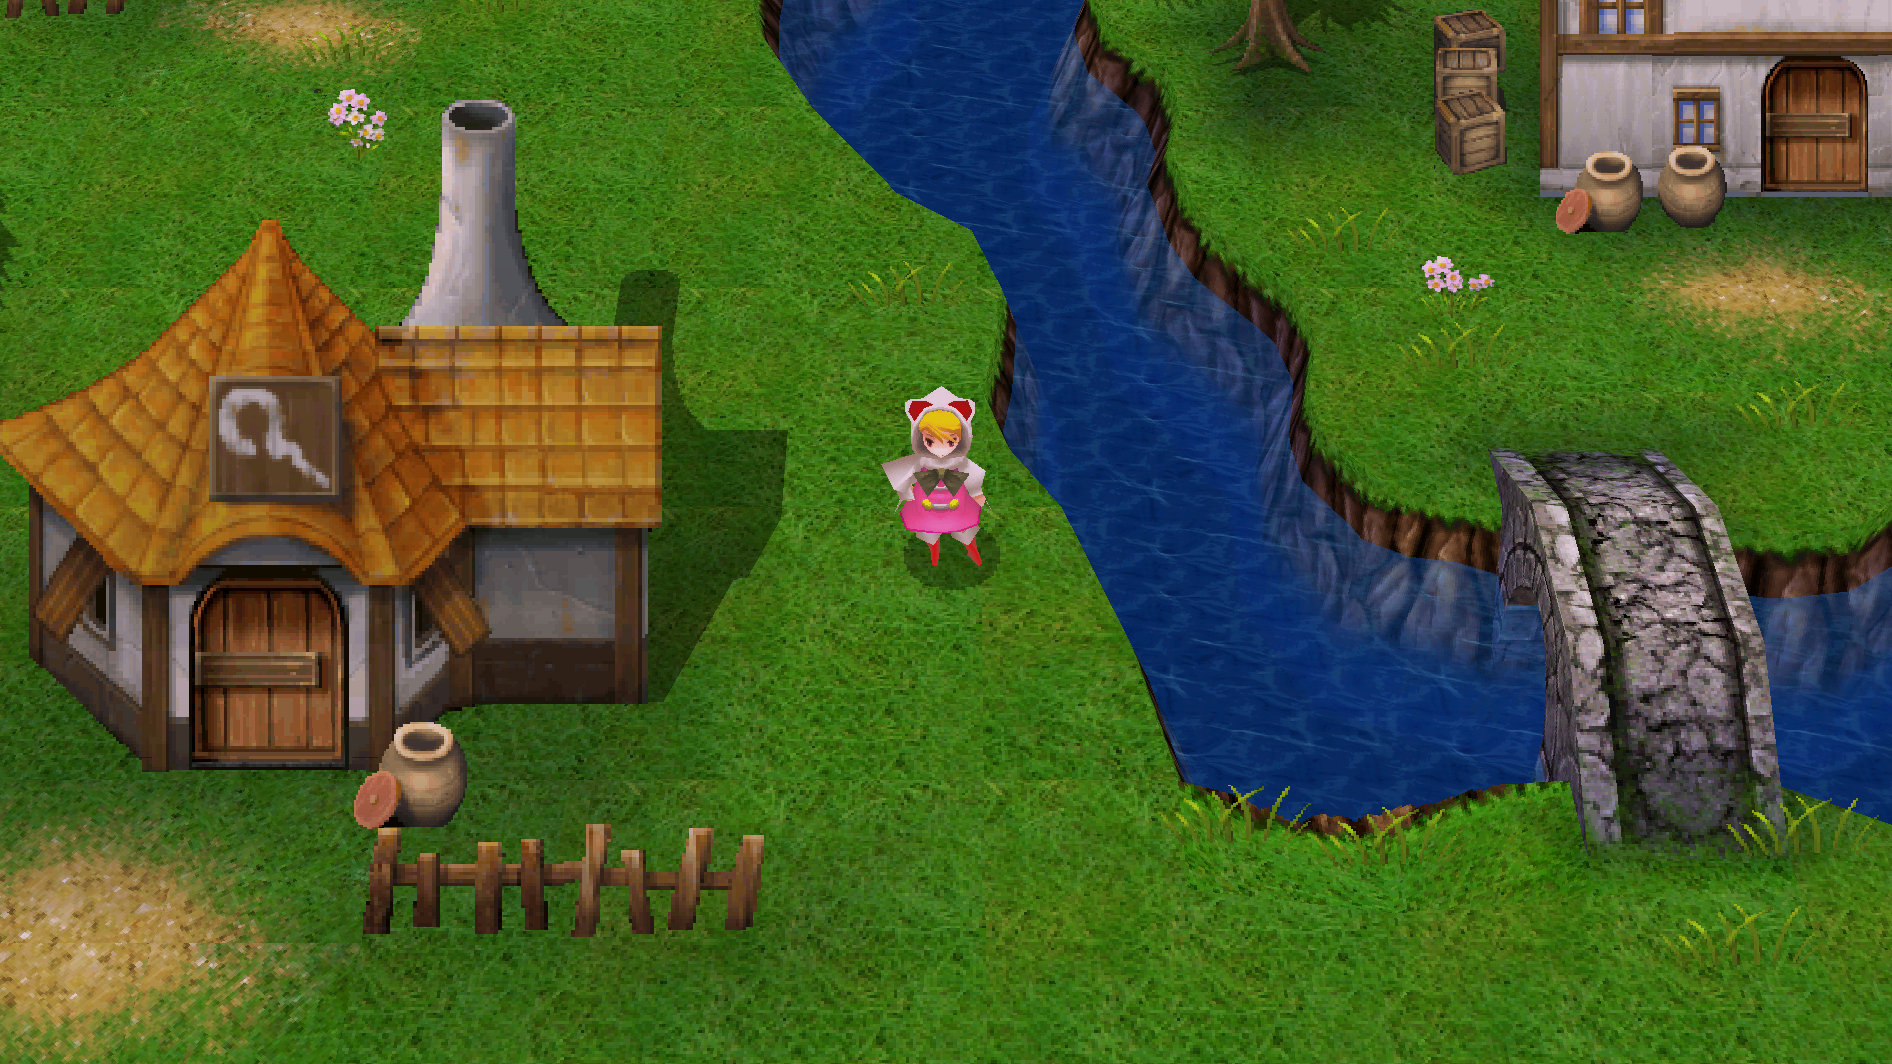 Gysahl (Final Fantasy III) | Final Fantasy Wiki | FANDOM powered by ...